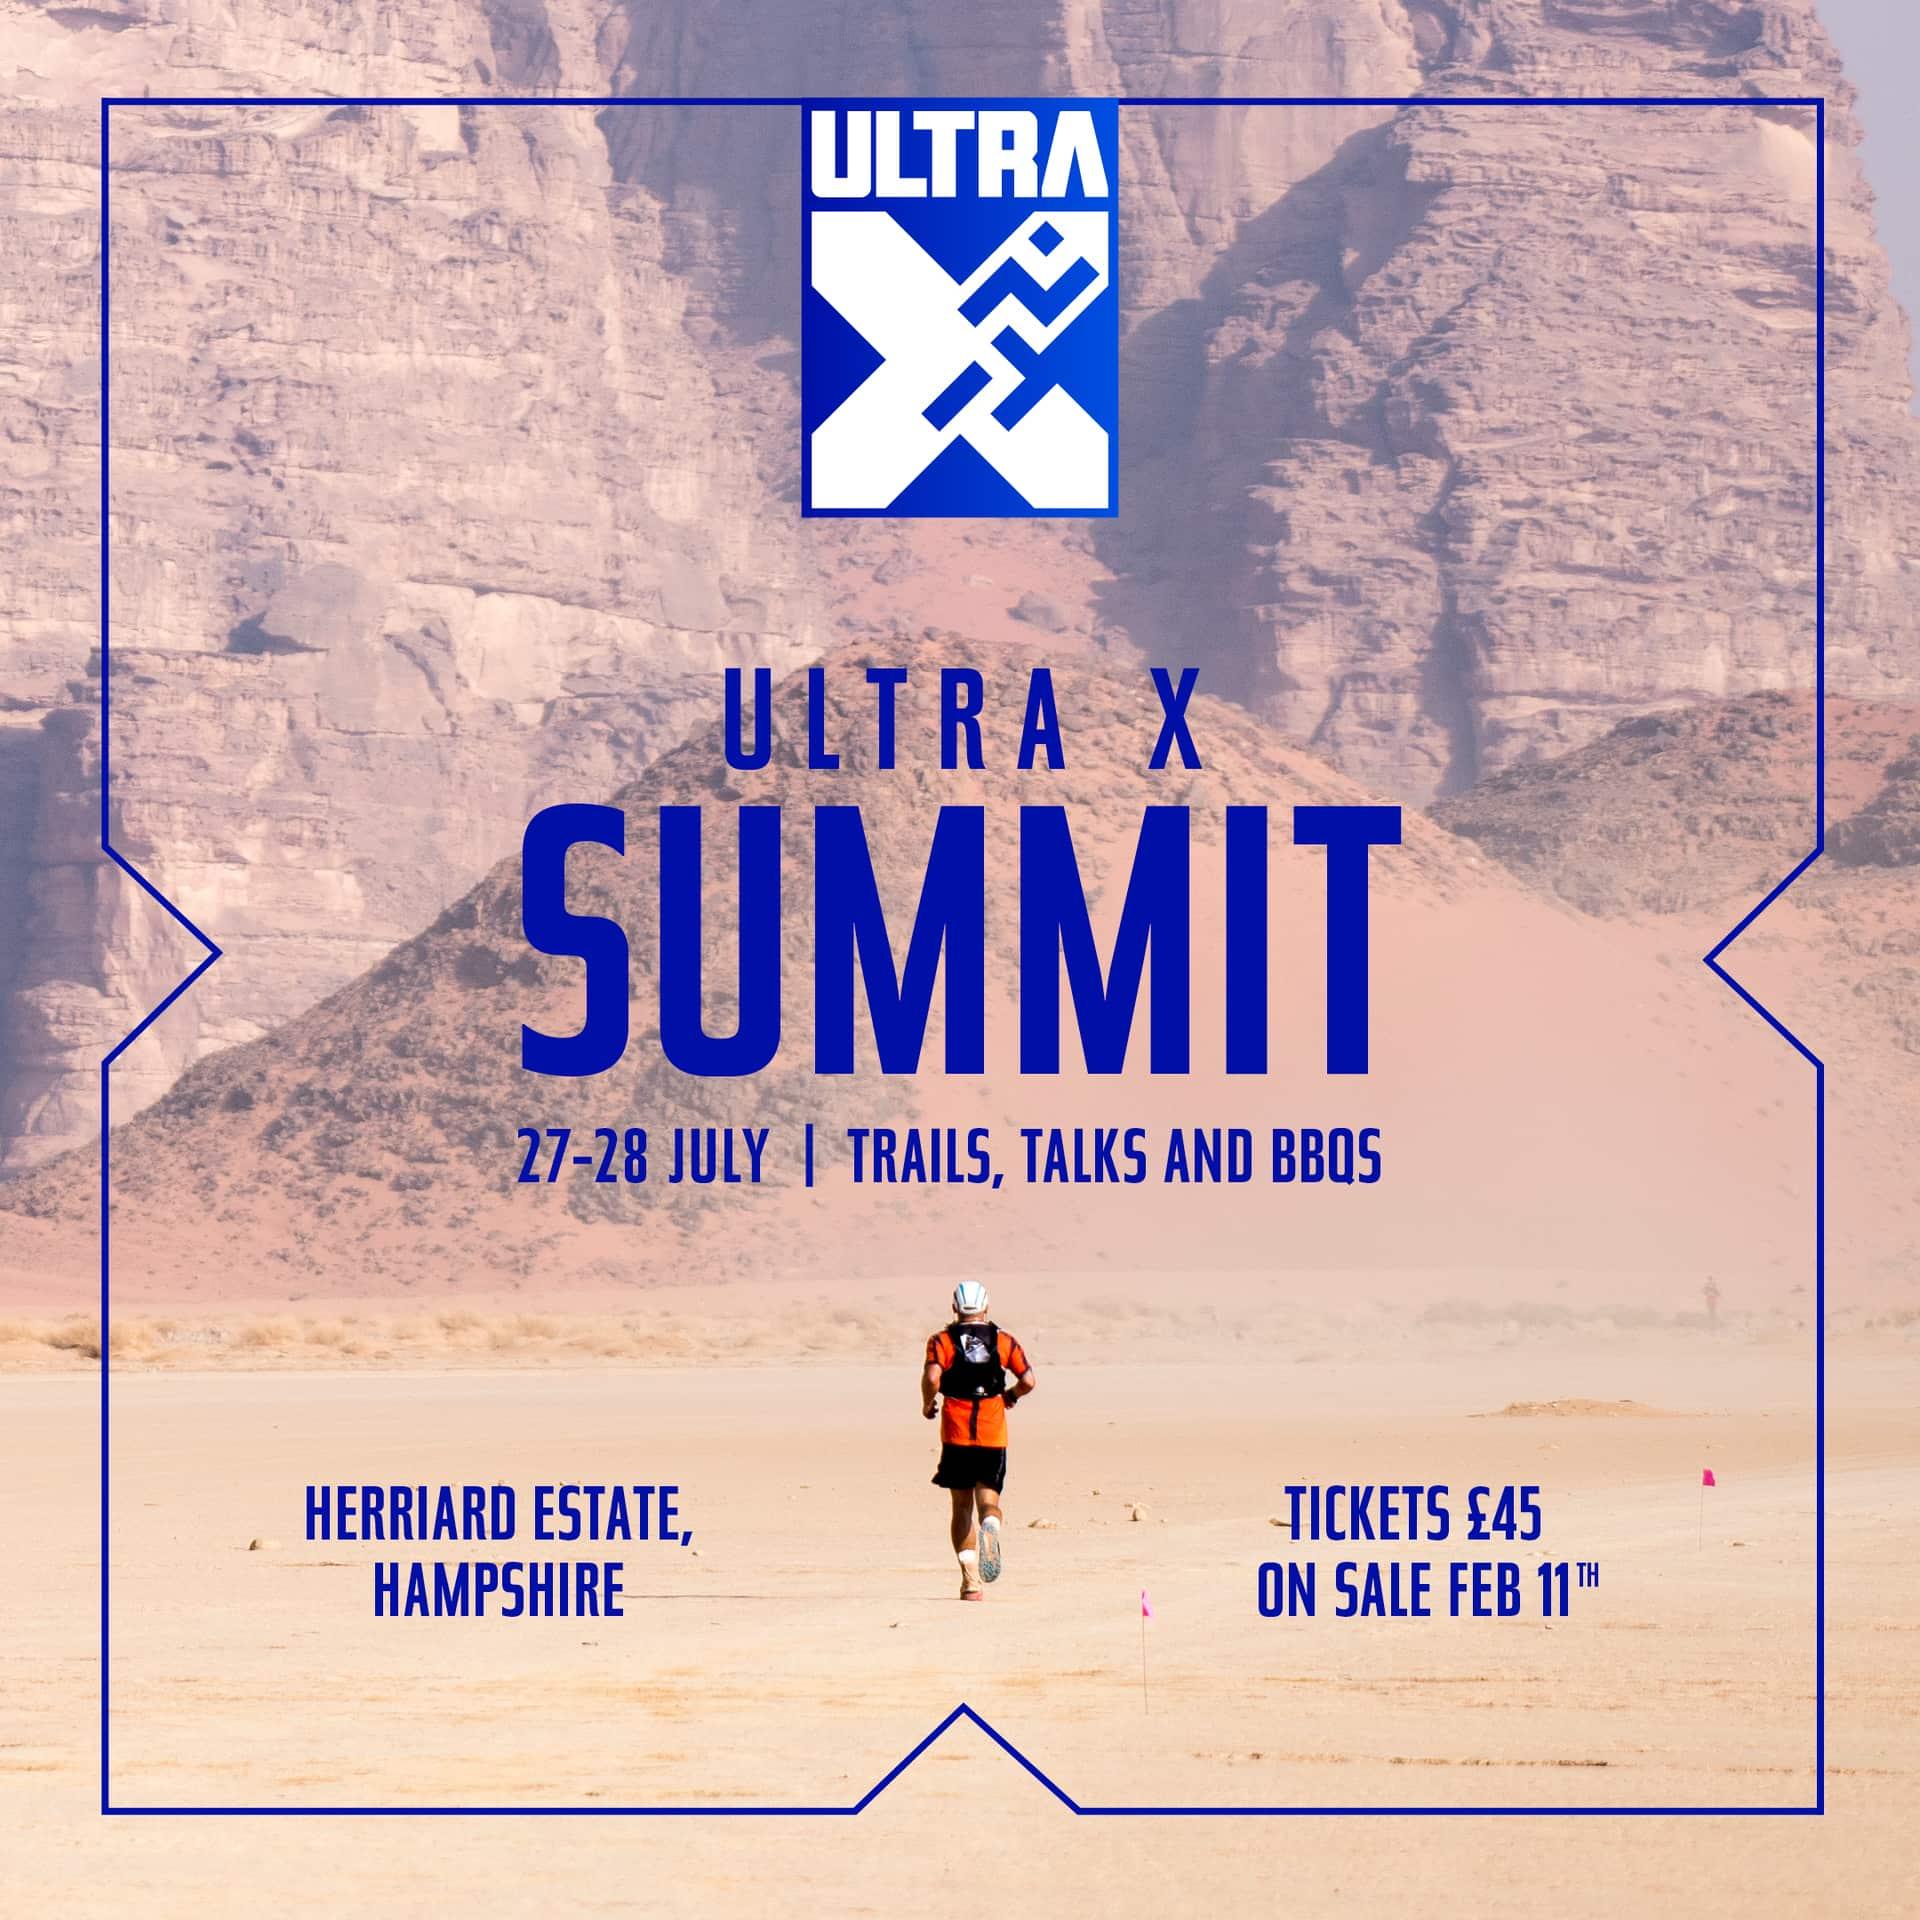 Launching the Ultra X Summit Ultra X